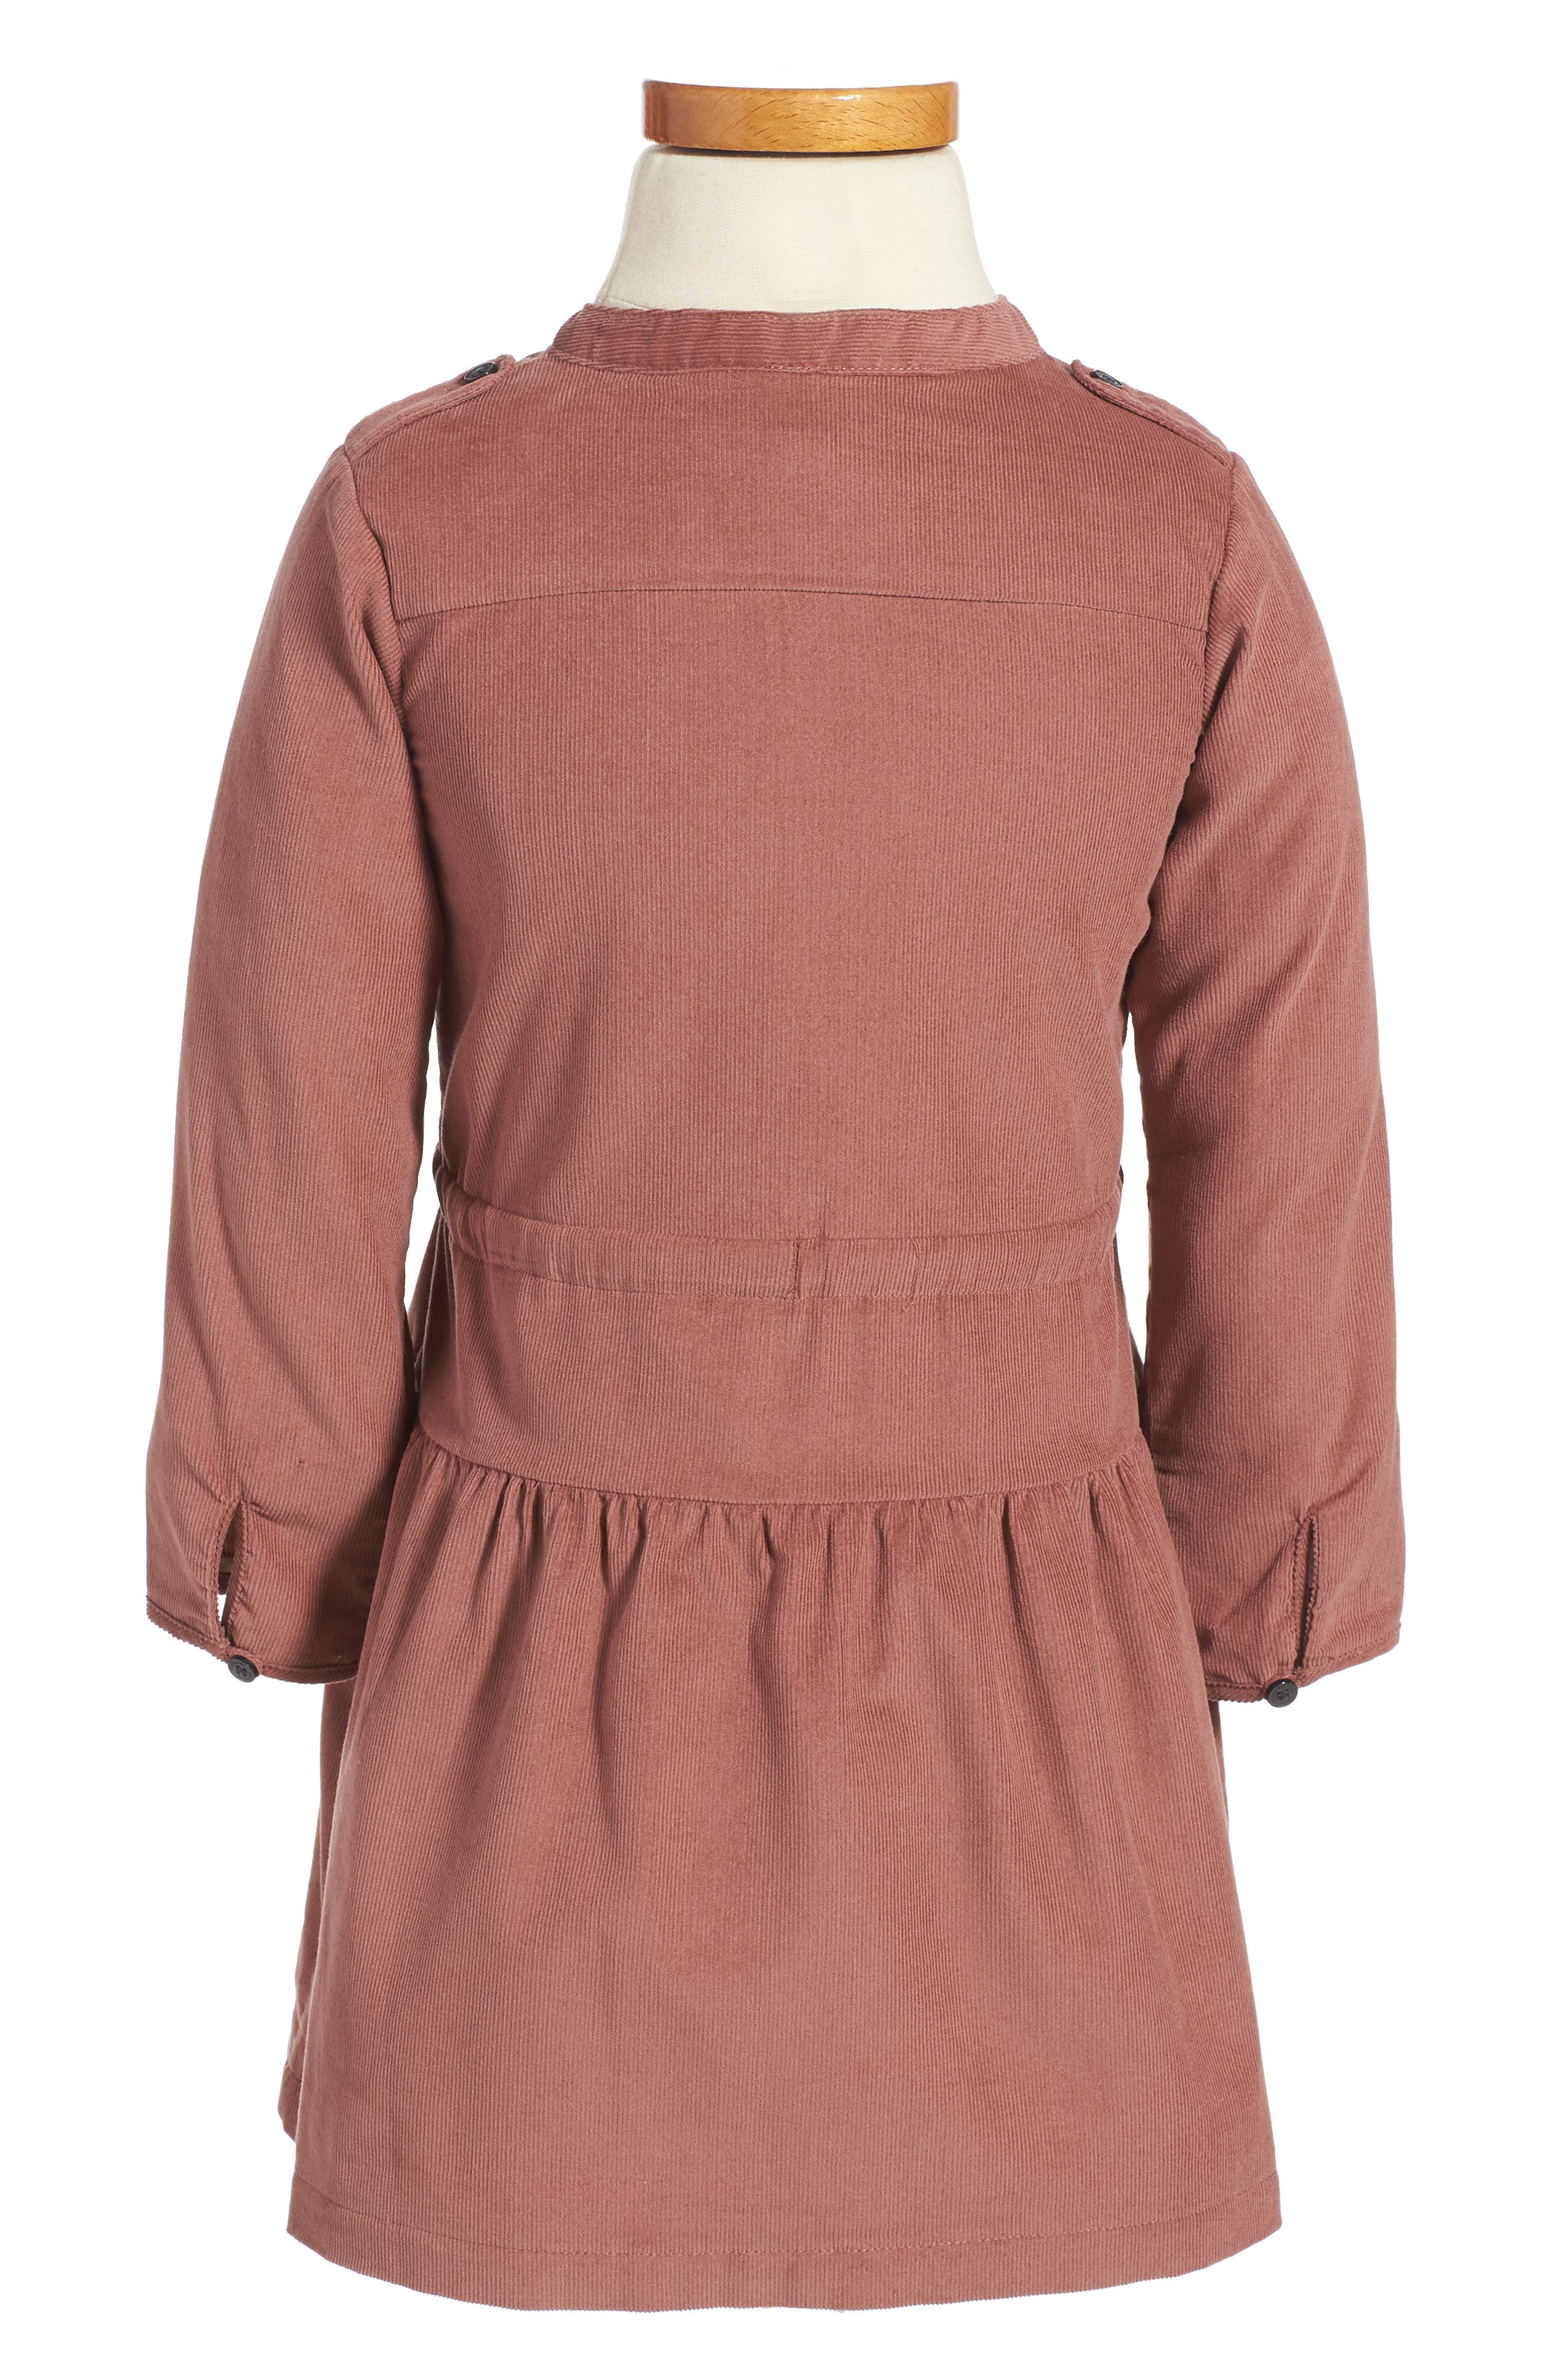 Alternate Image 2  - Burberry Mini Celestine Corduroy Dress (Toddler Girls)